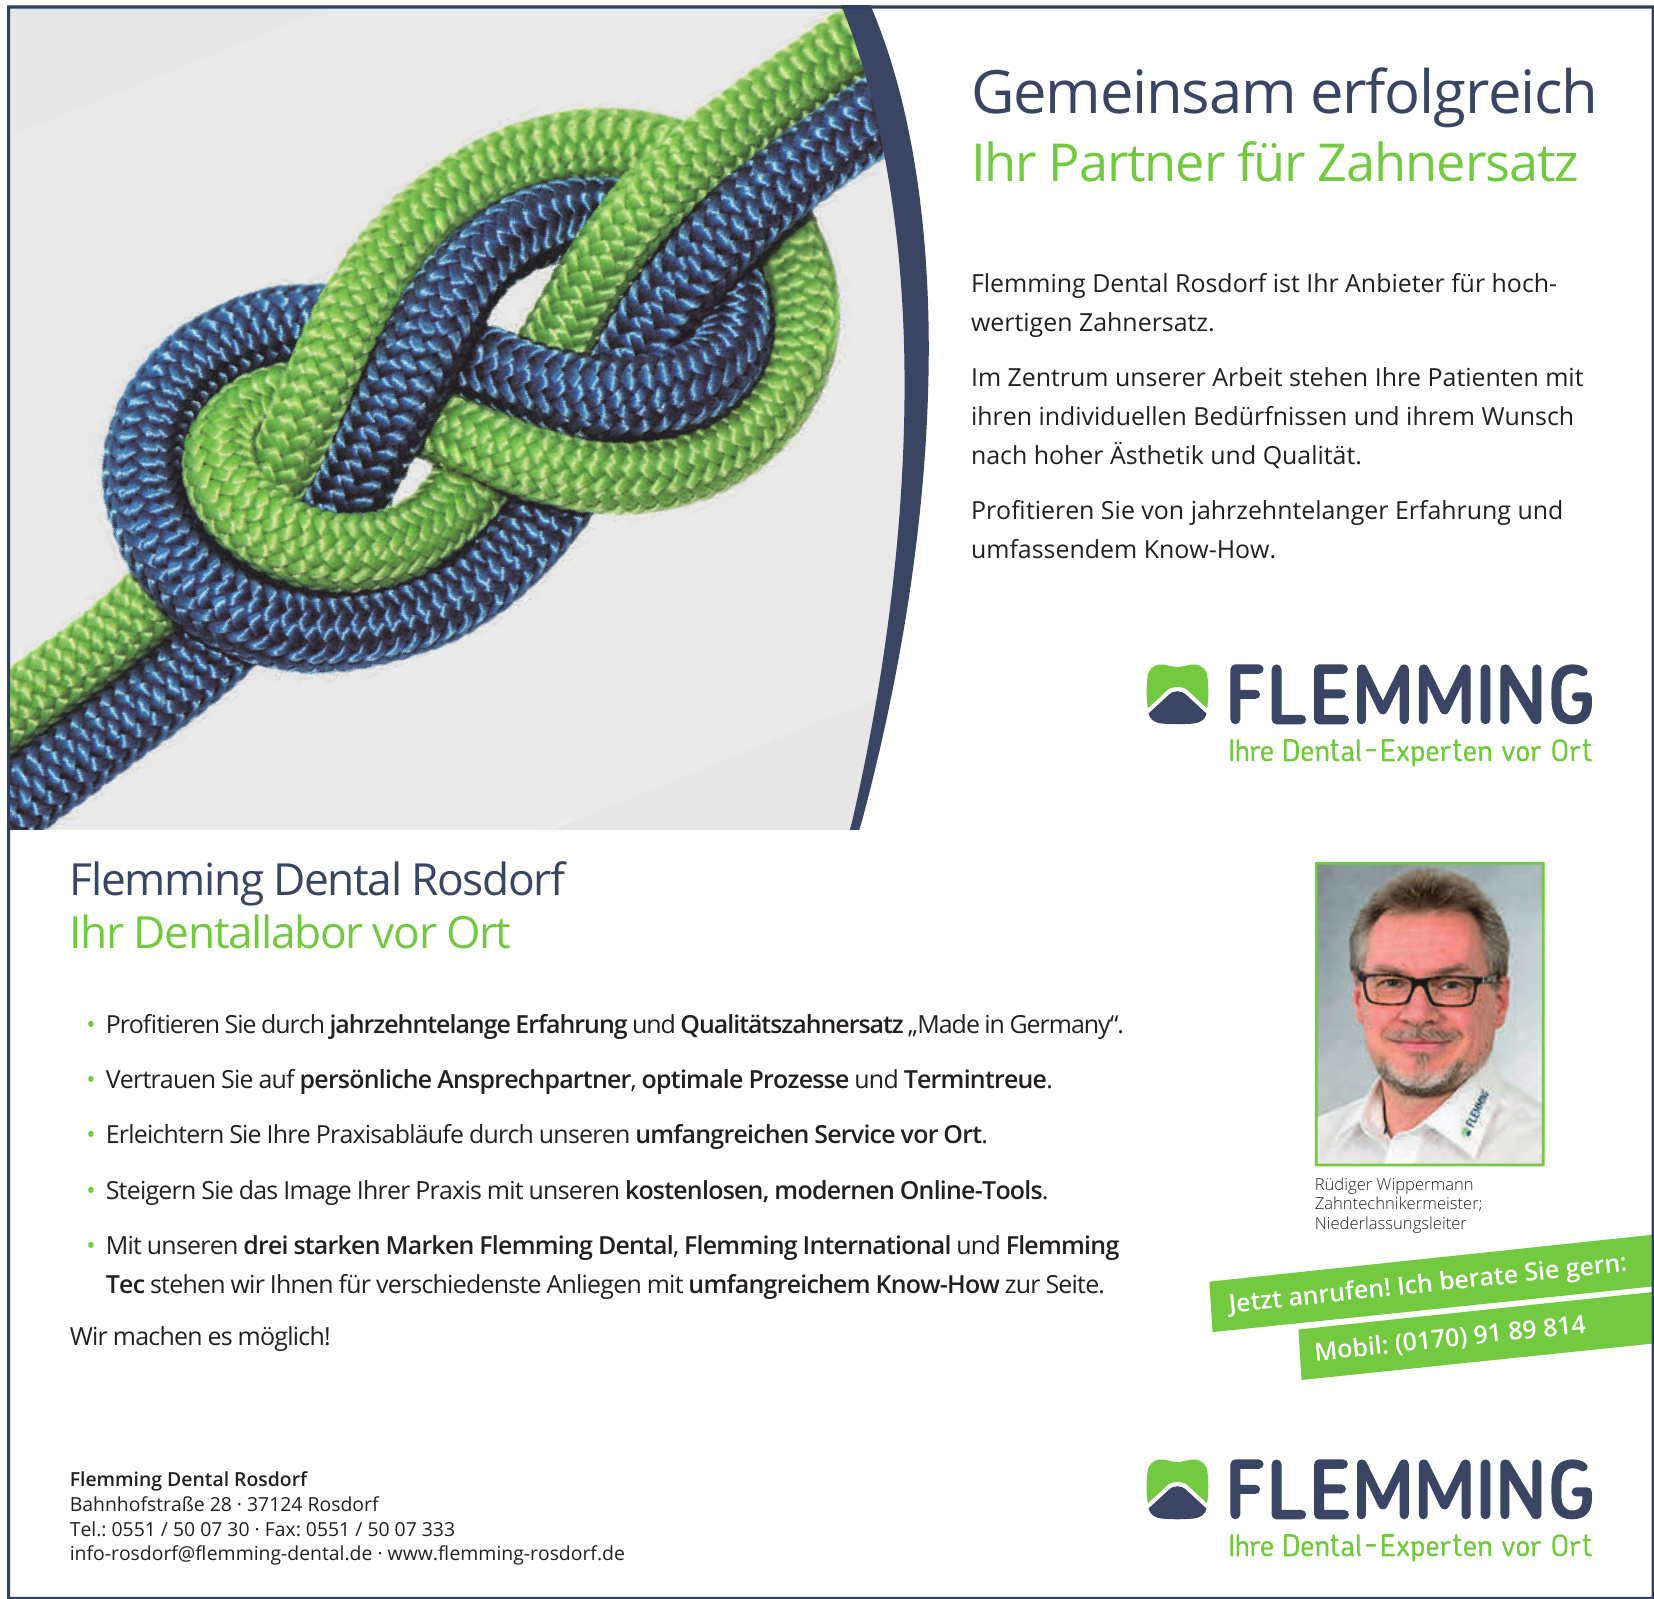 Flemming Dental Rosdorf